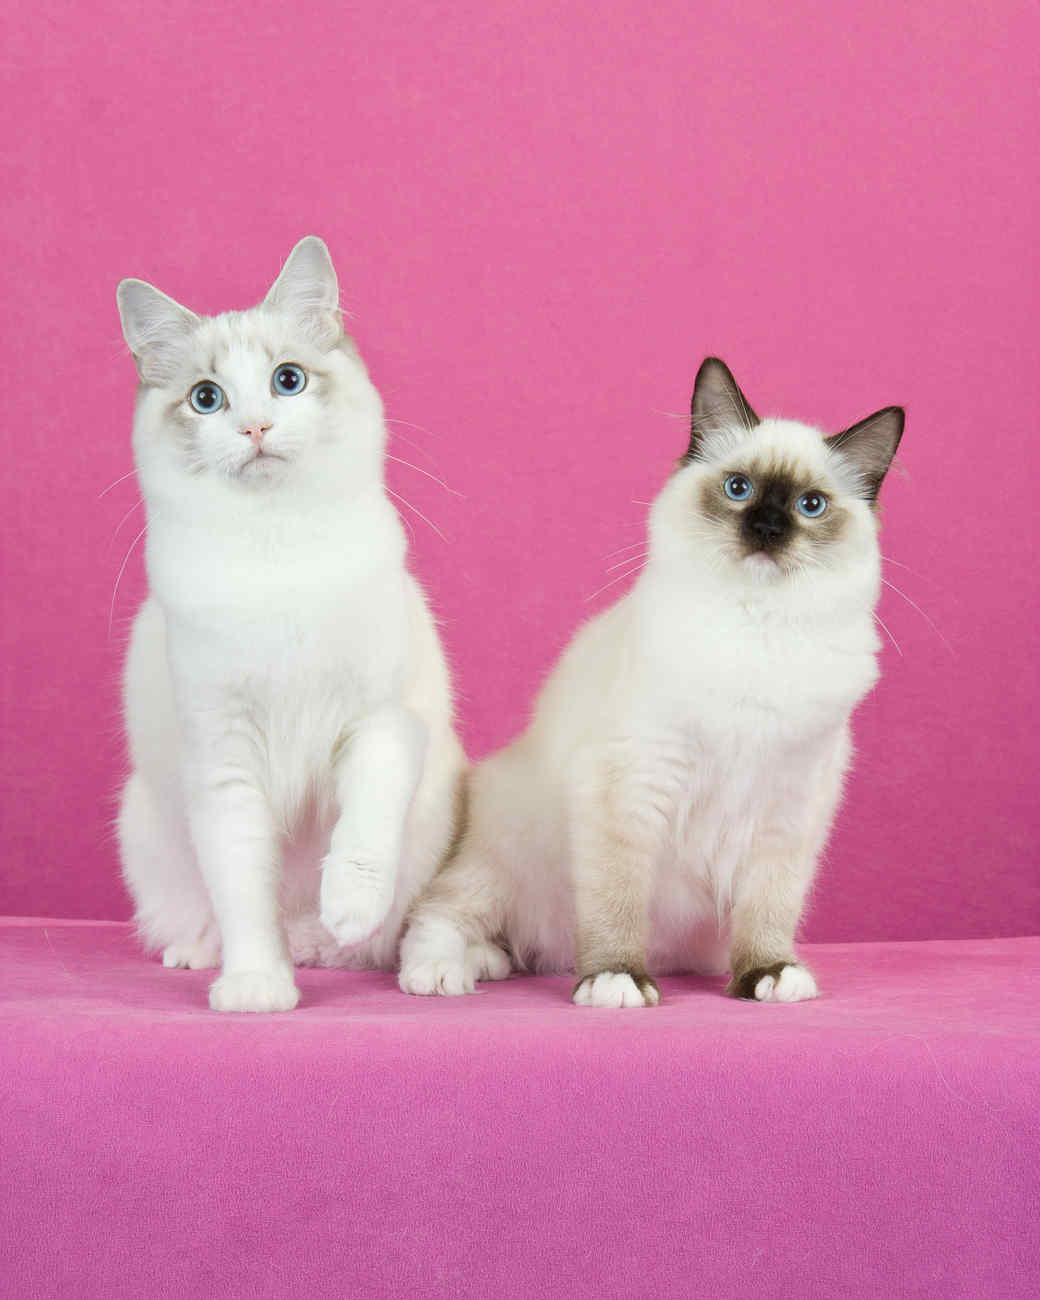 cat-breeds-ragdoll-kg26-872.jpg